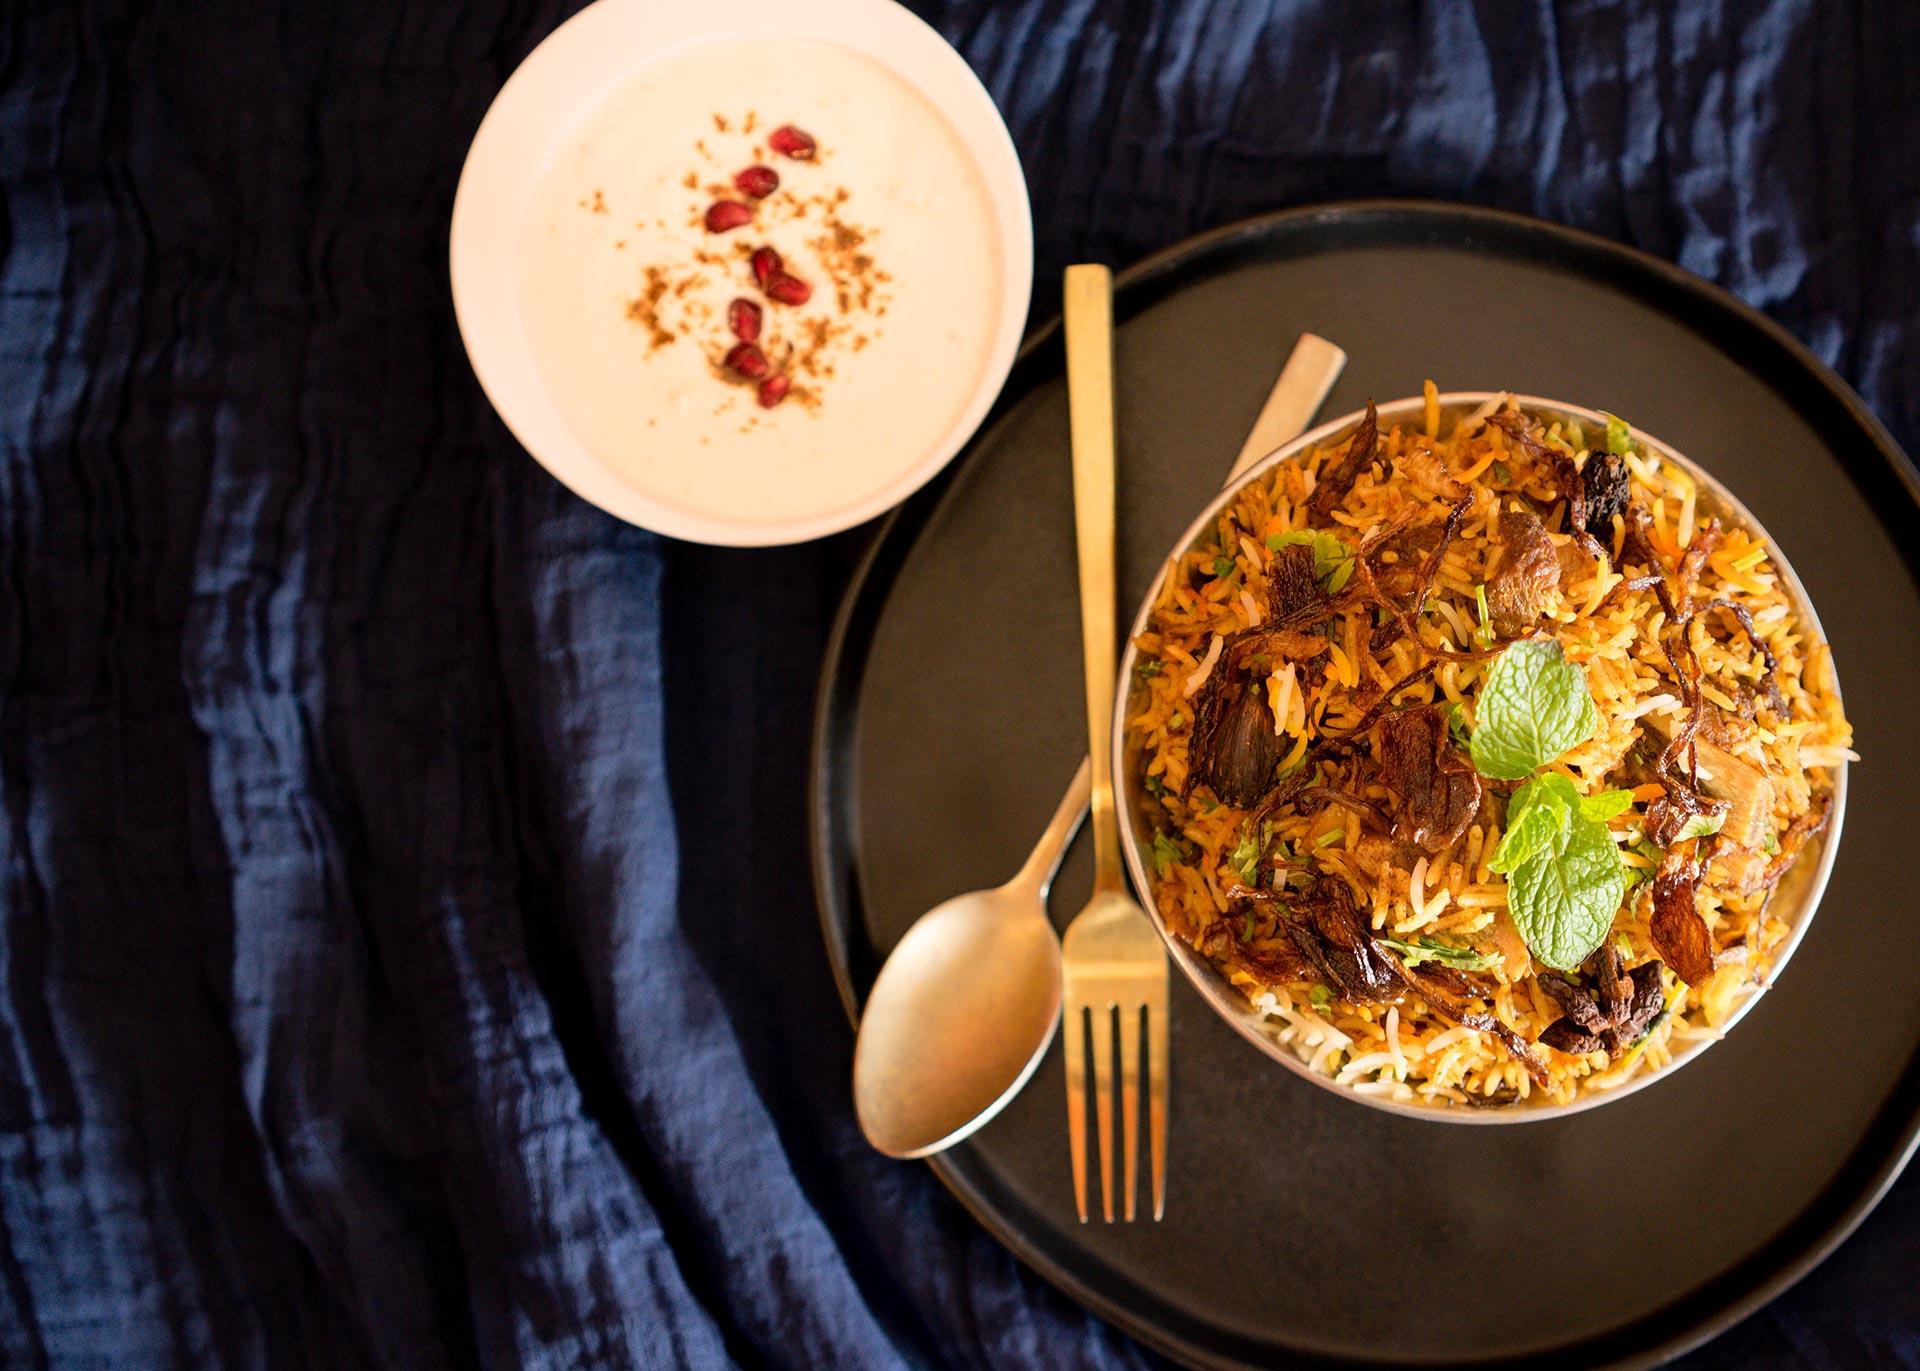 keeva-sf-restaurant-food-photographer-a-few-good-clicks-52-copy.jpg